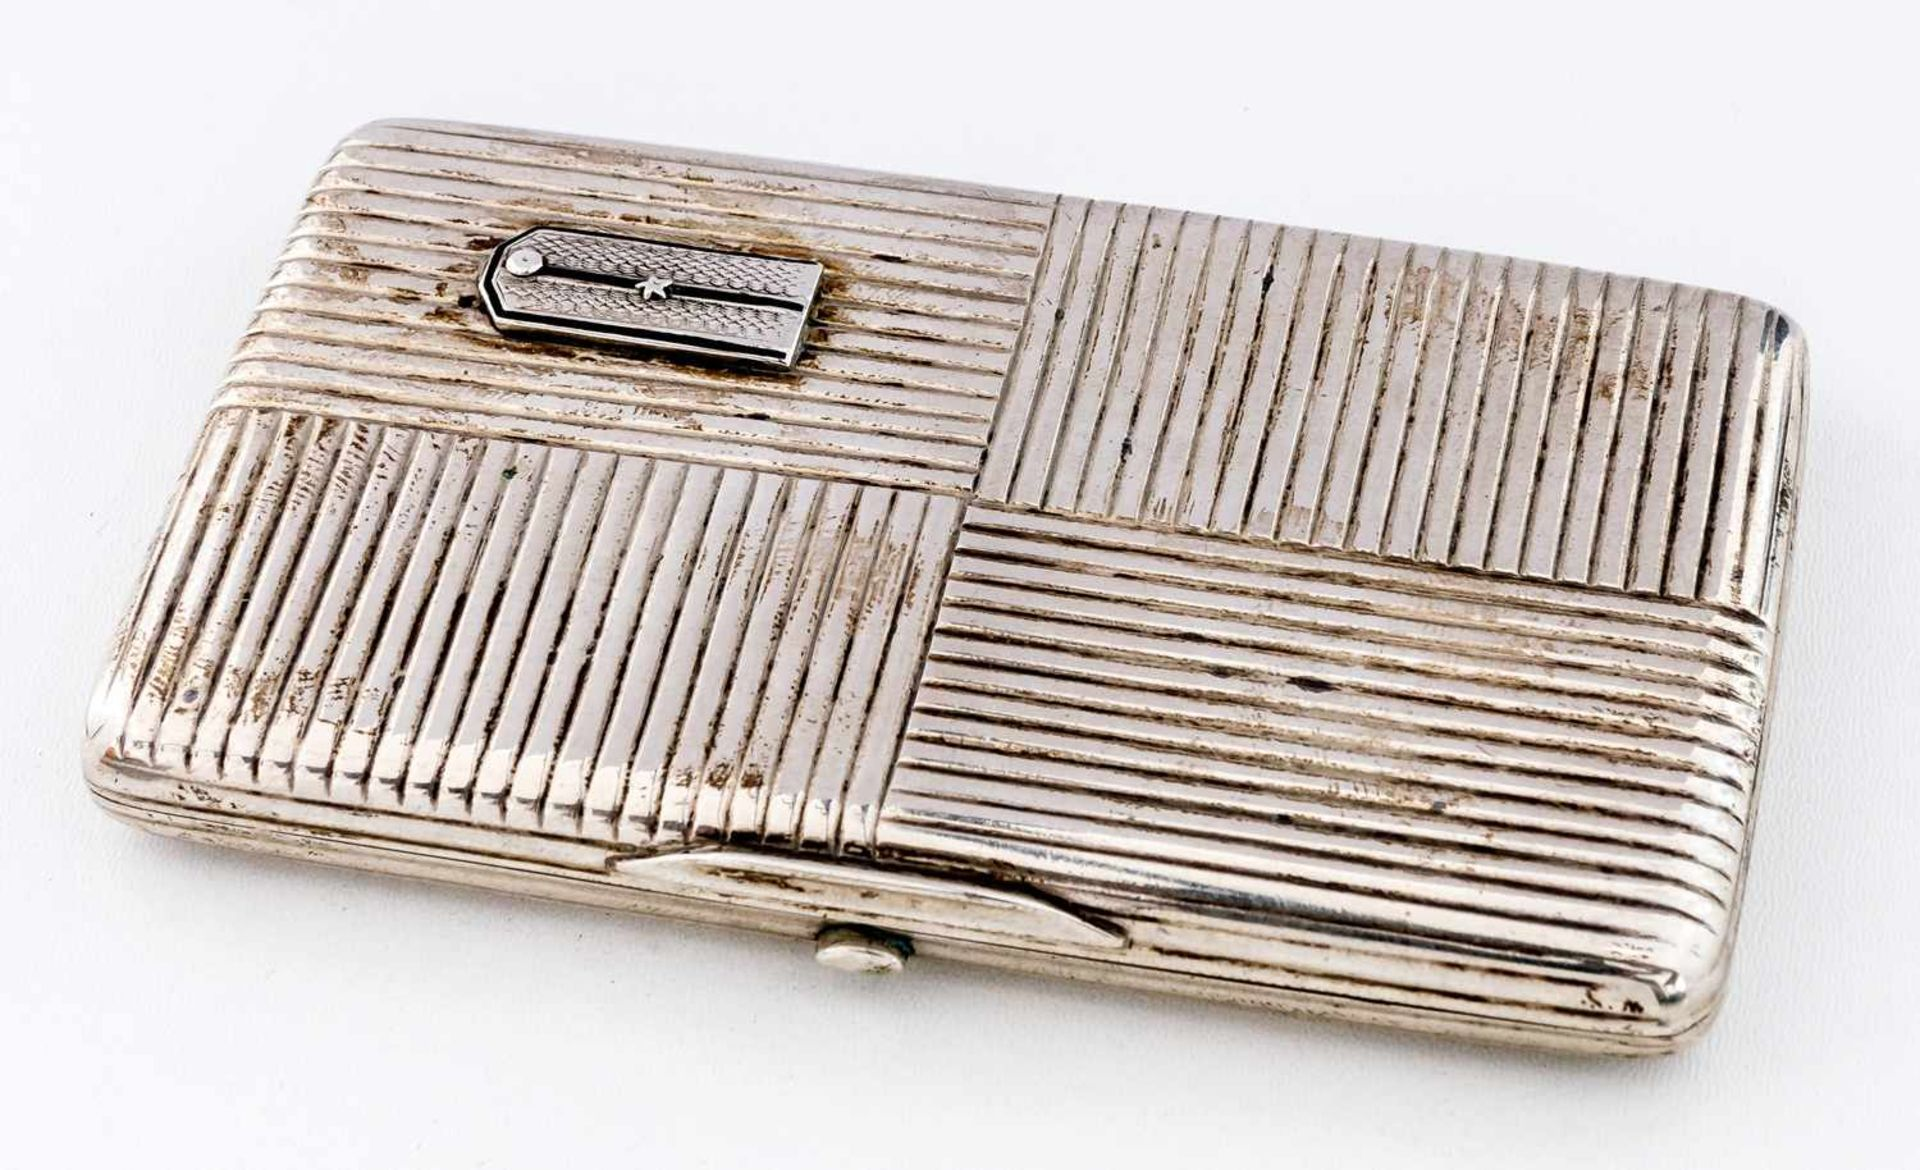 Zigarettenetui mit Offiziersschulterstück Russland, Silber (143g), Moskau 1908-1917 Meister: Ivan